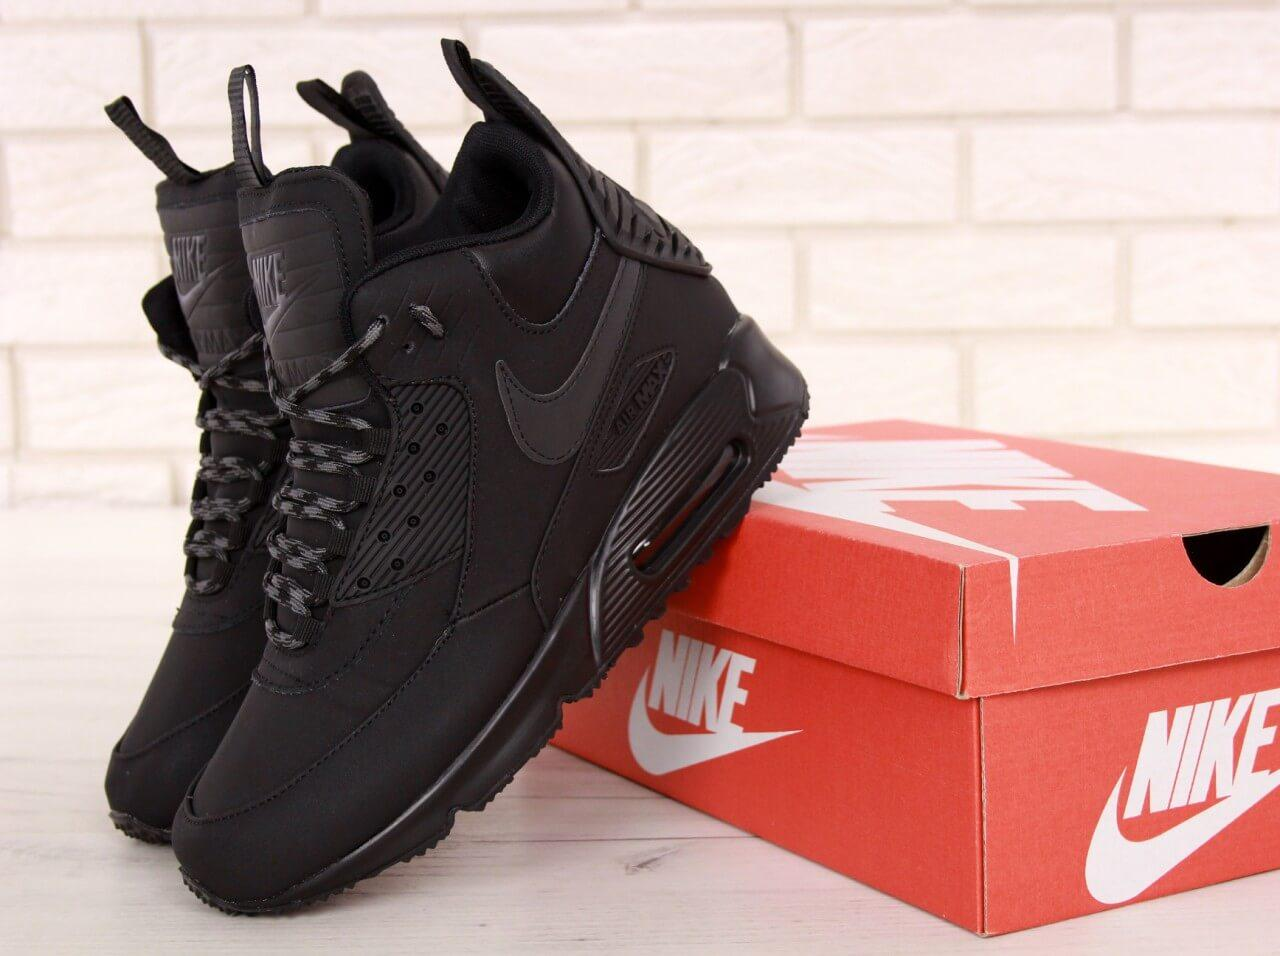 Мужские зимние термо кроссовки Nike Air Max 90 Sneakerboot Winter в черном цвете, фото 1